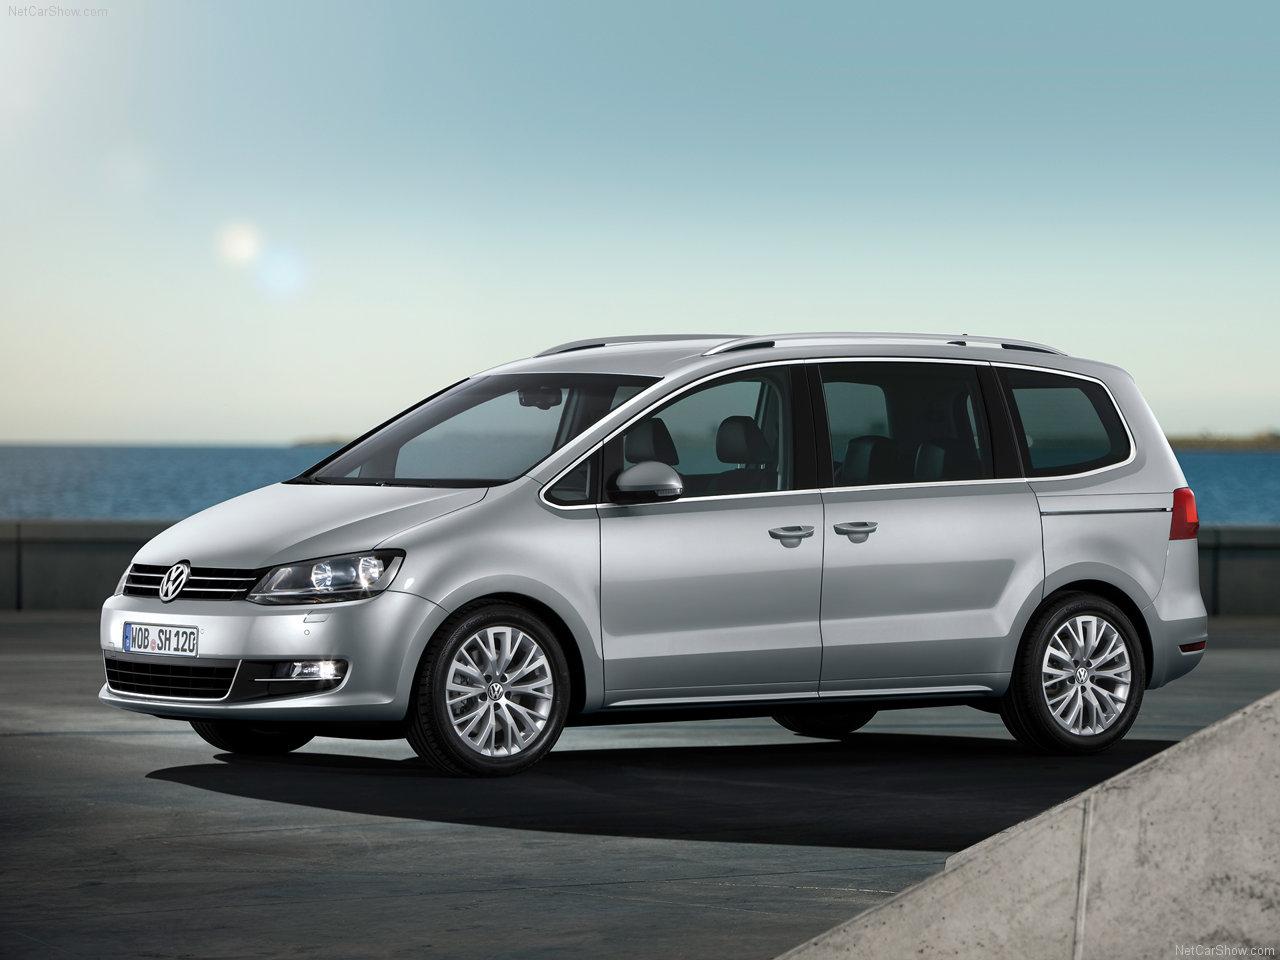 new cars used cars family car 2011 volkswagen sharan. Black Bedroom Furniture Sets. Home Design Ideas